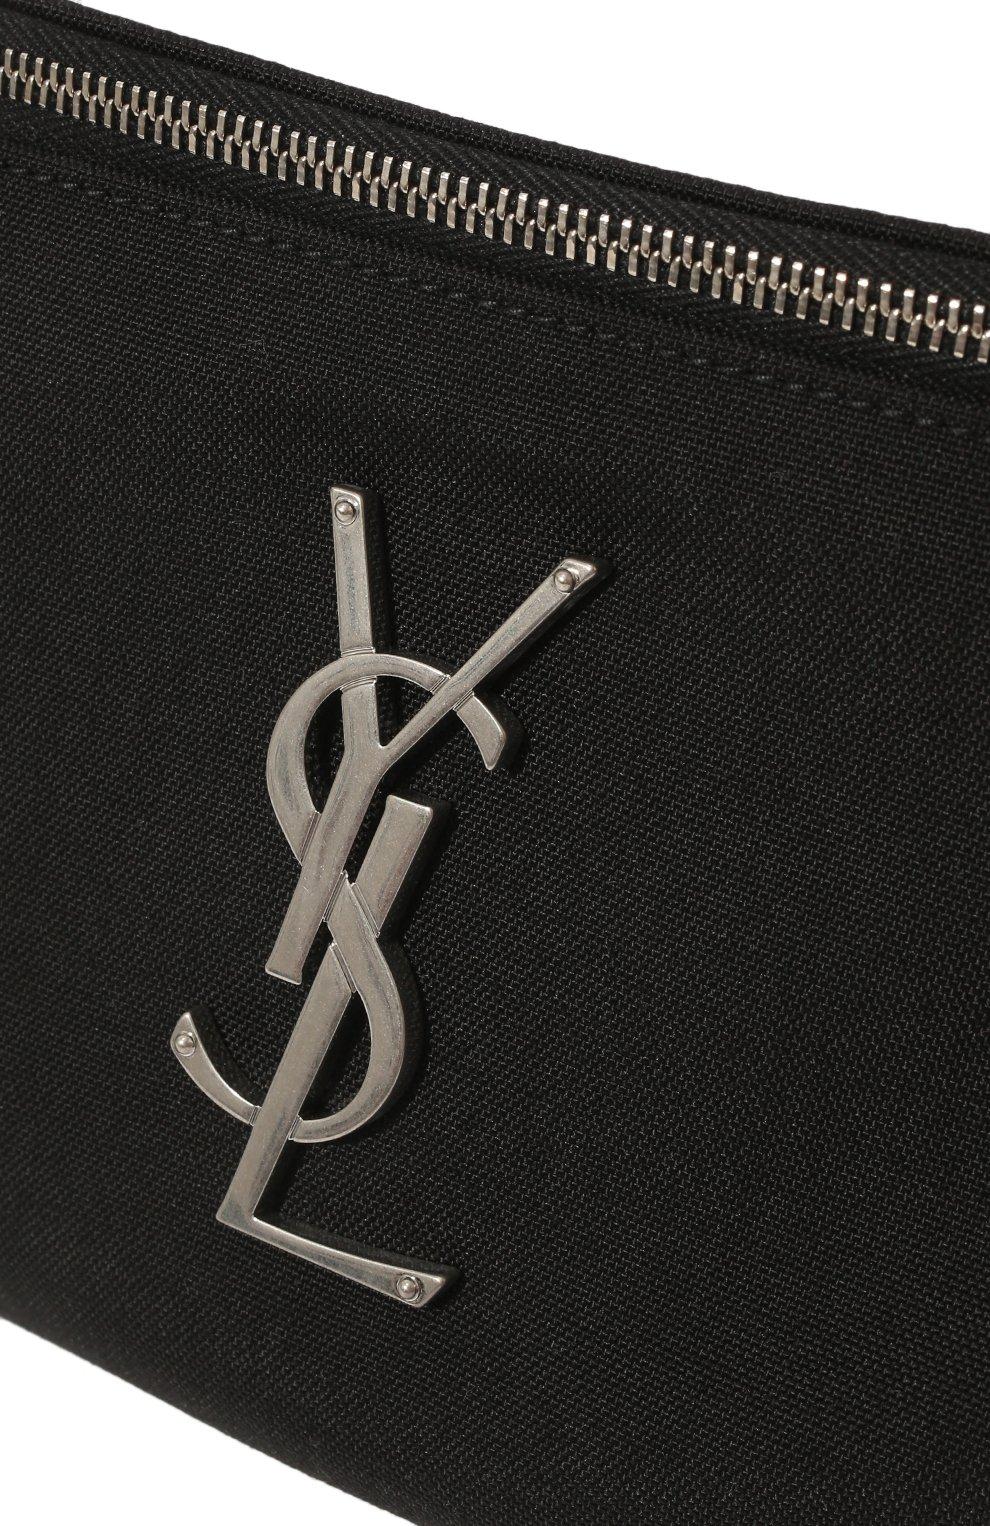 Мужская текстильная поясная сумка SAINT LAURENT черного цвета, арт. 590076/GIV6E | Фото 3 (Материал: Текстиль)